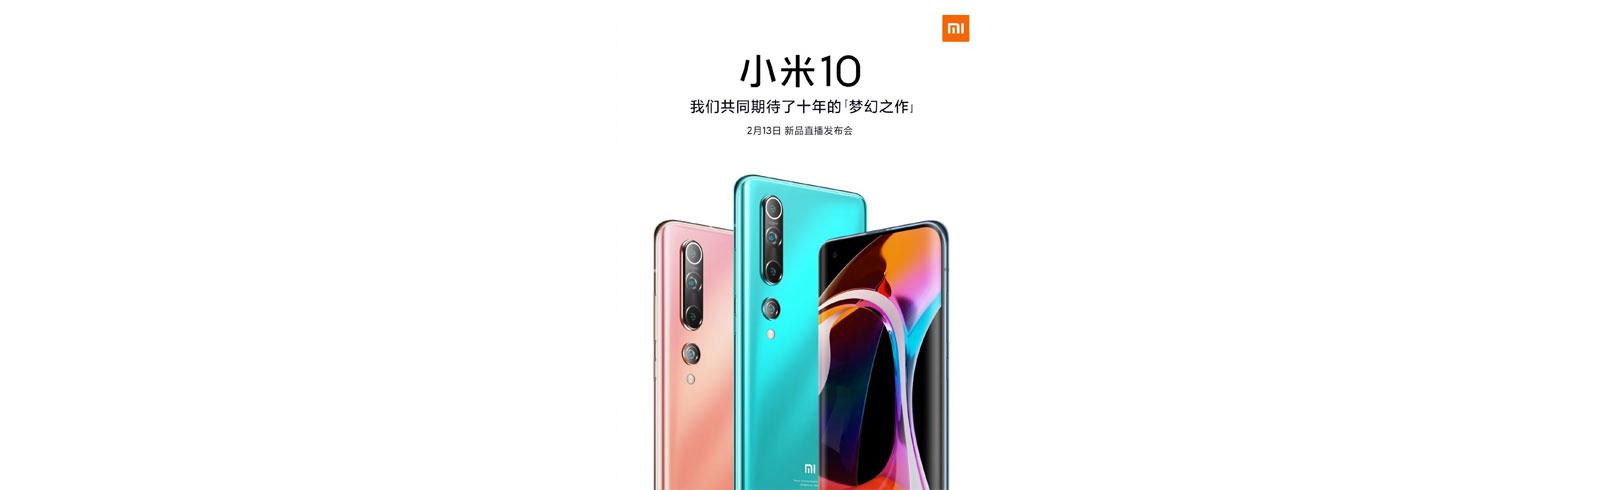 Xiaomi Mi 10 will have a whole-body heat dissipation design